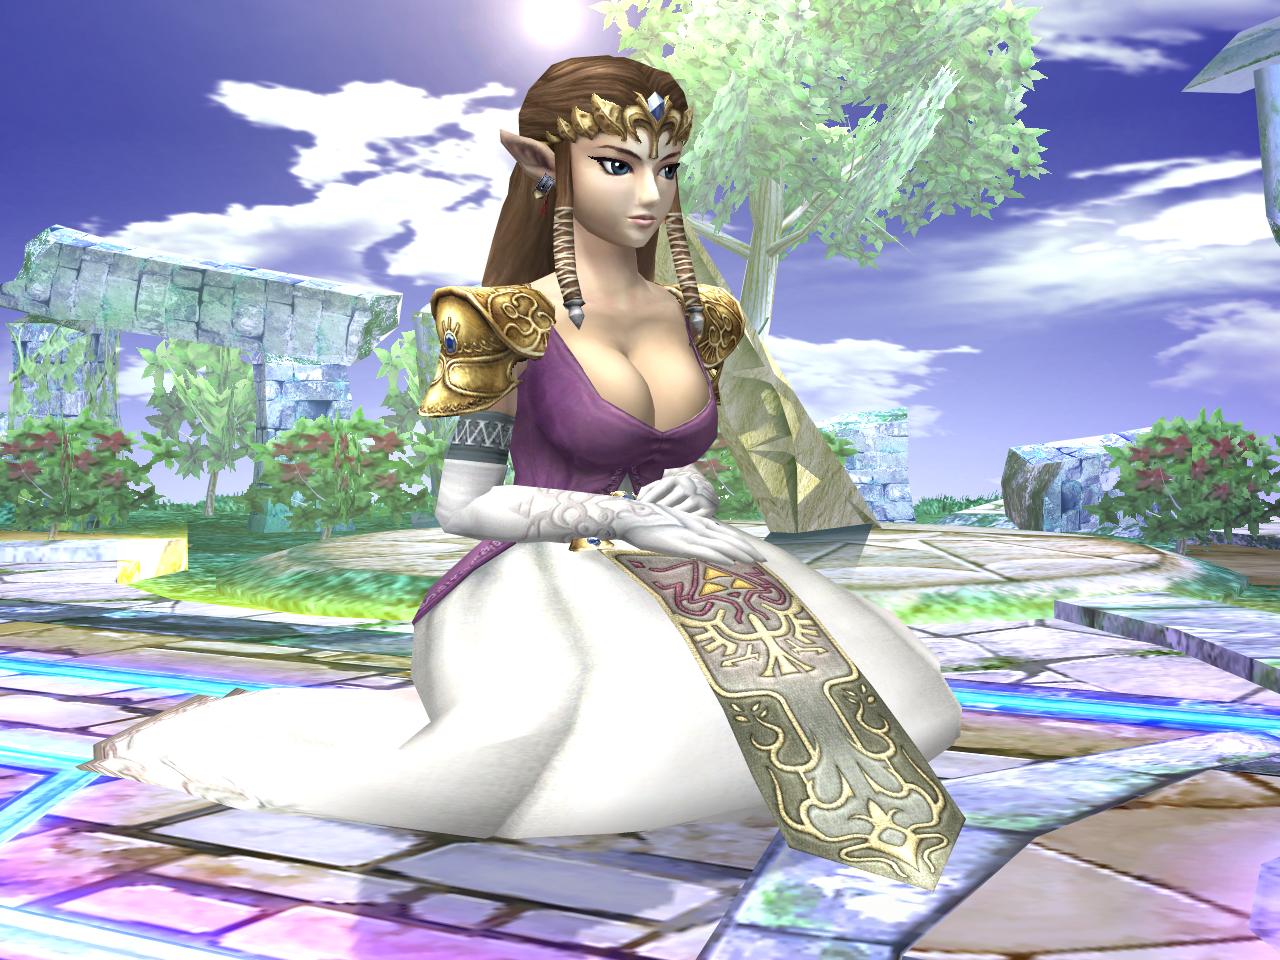 Zelda nude mod porn pic